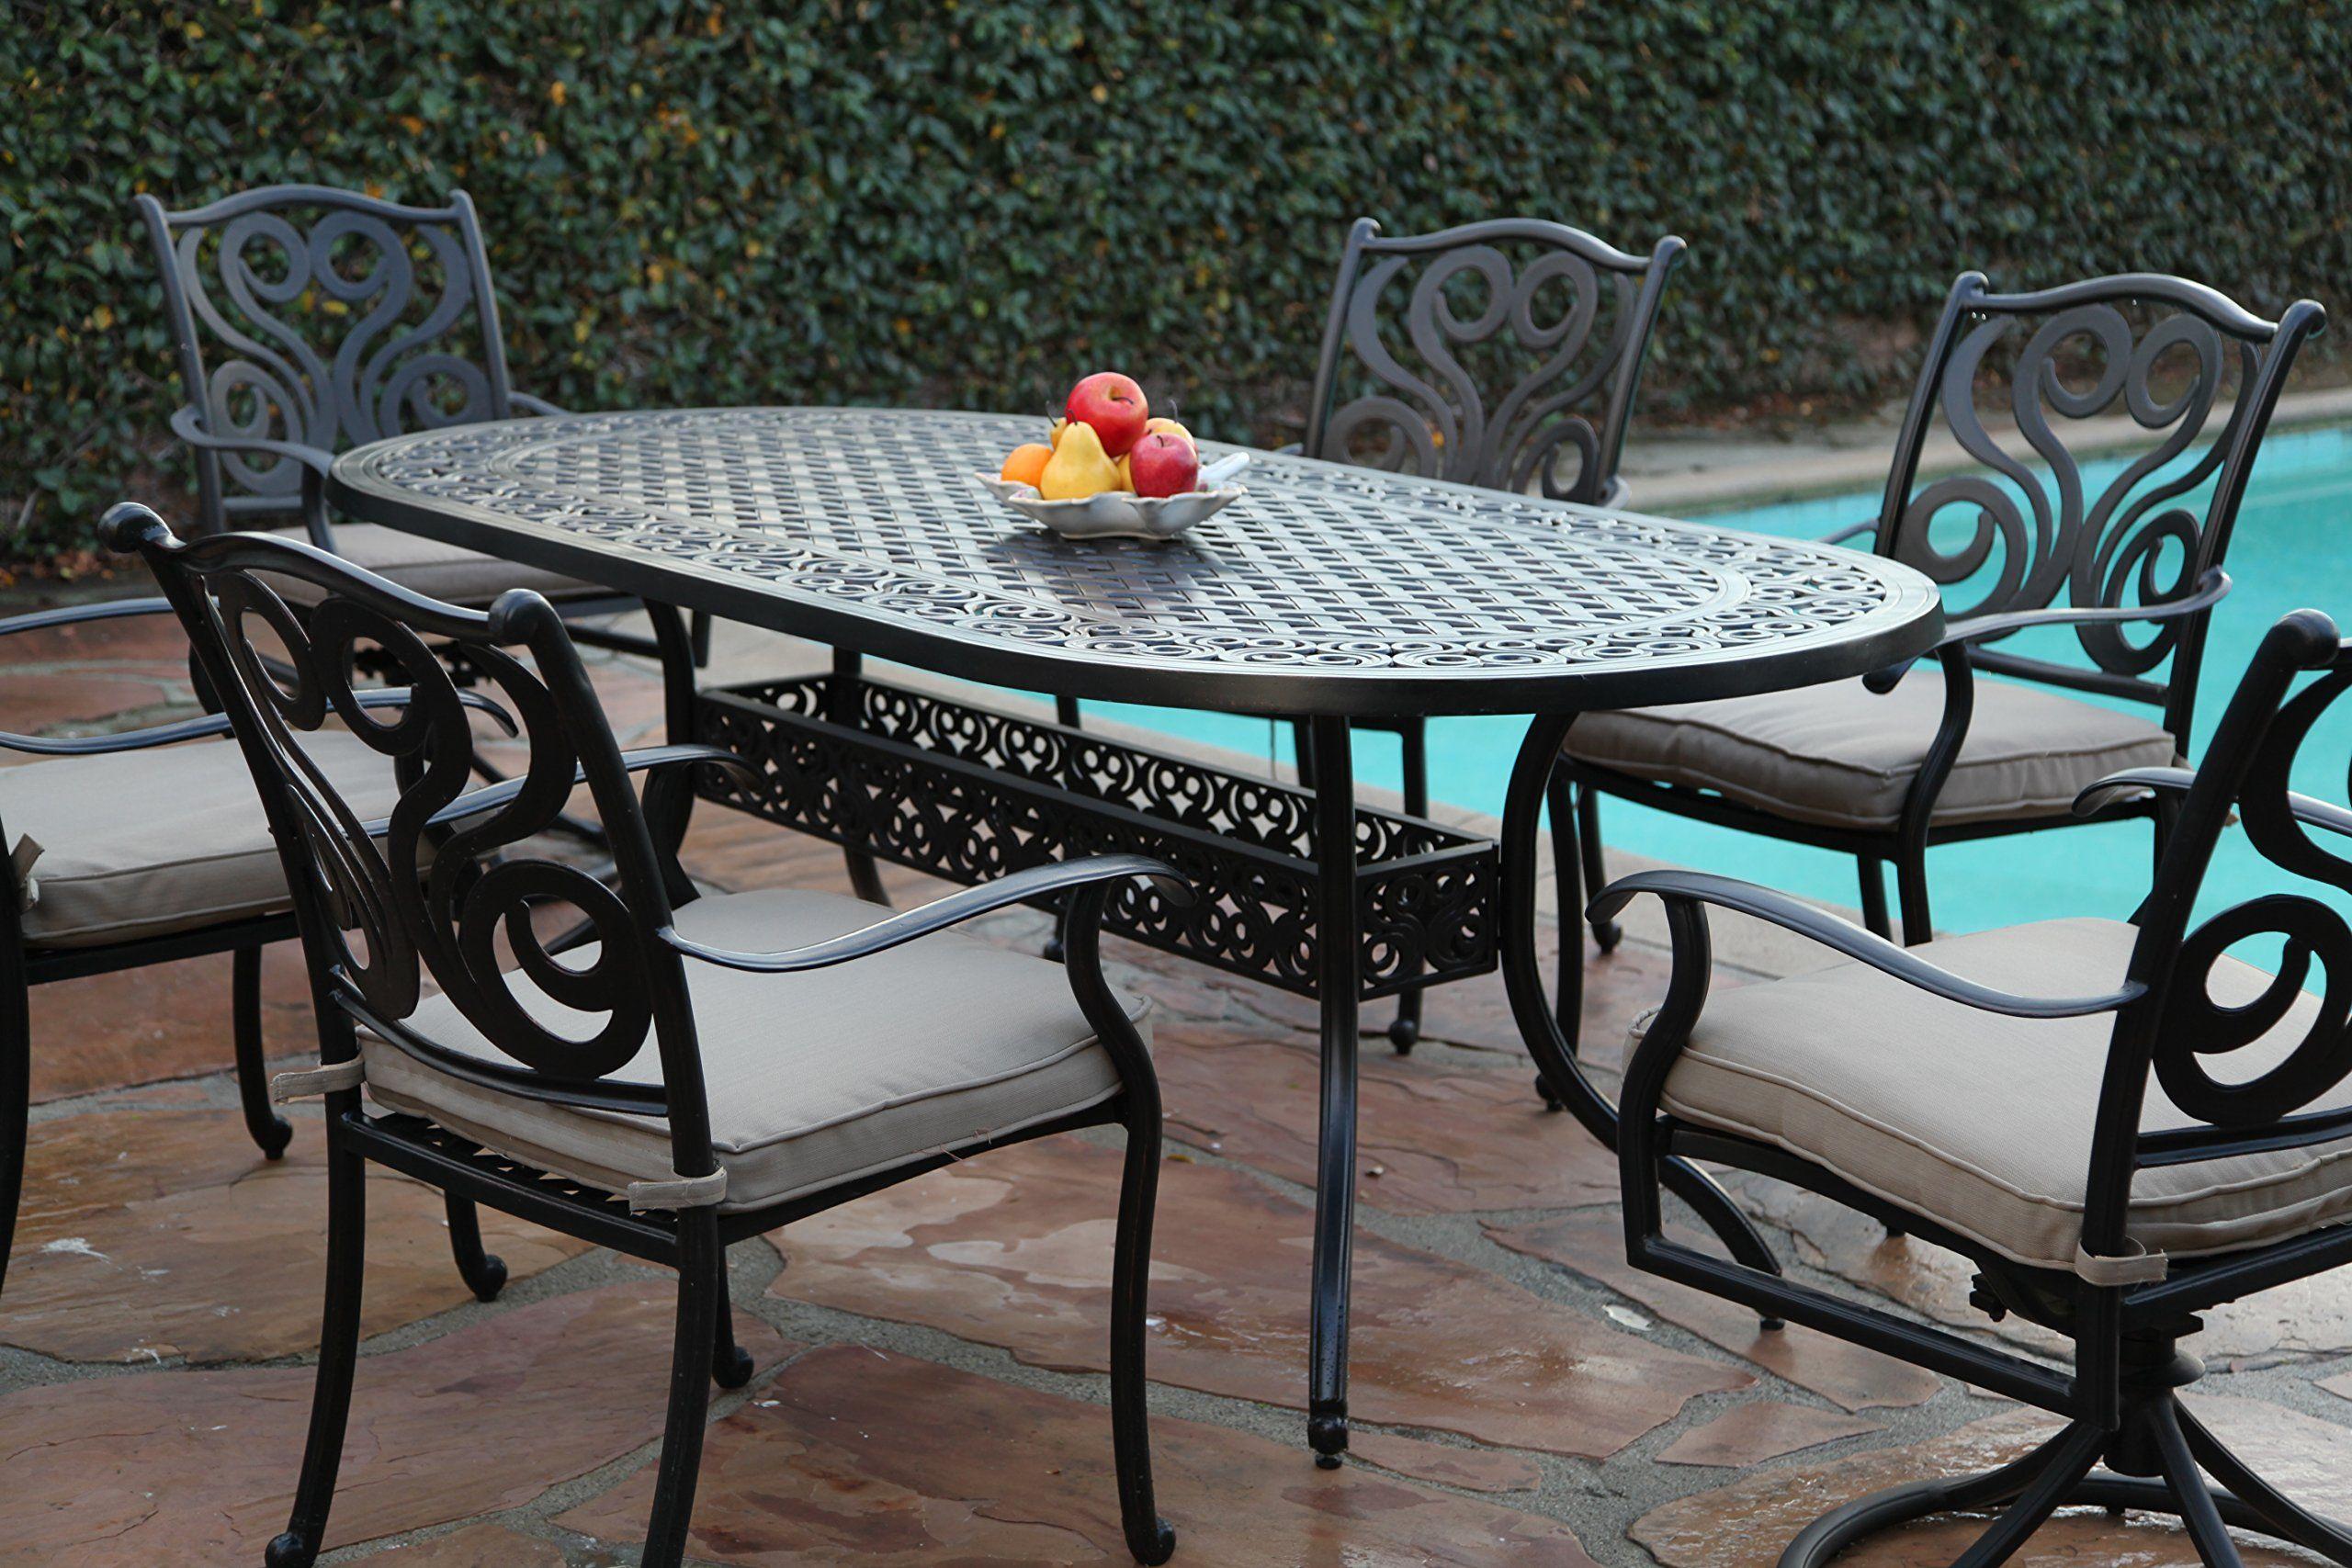 Cbm Outdoor Patio Furniture 7 Piece G Aluminum Dining Set With 2